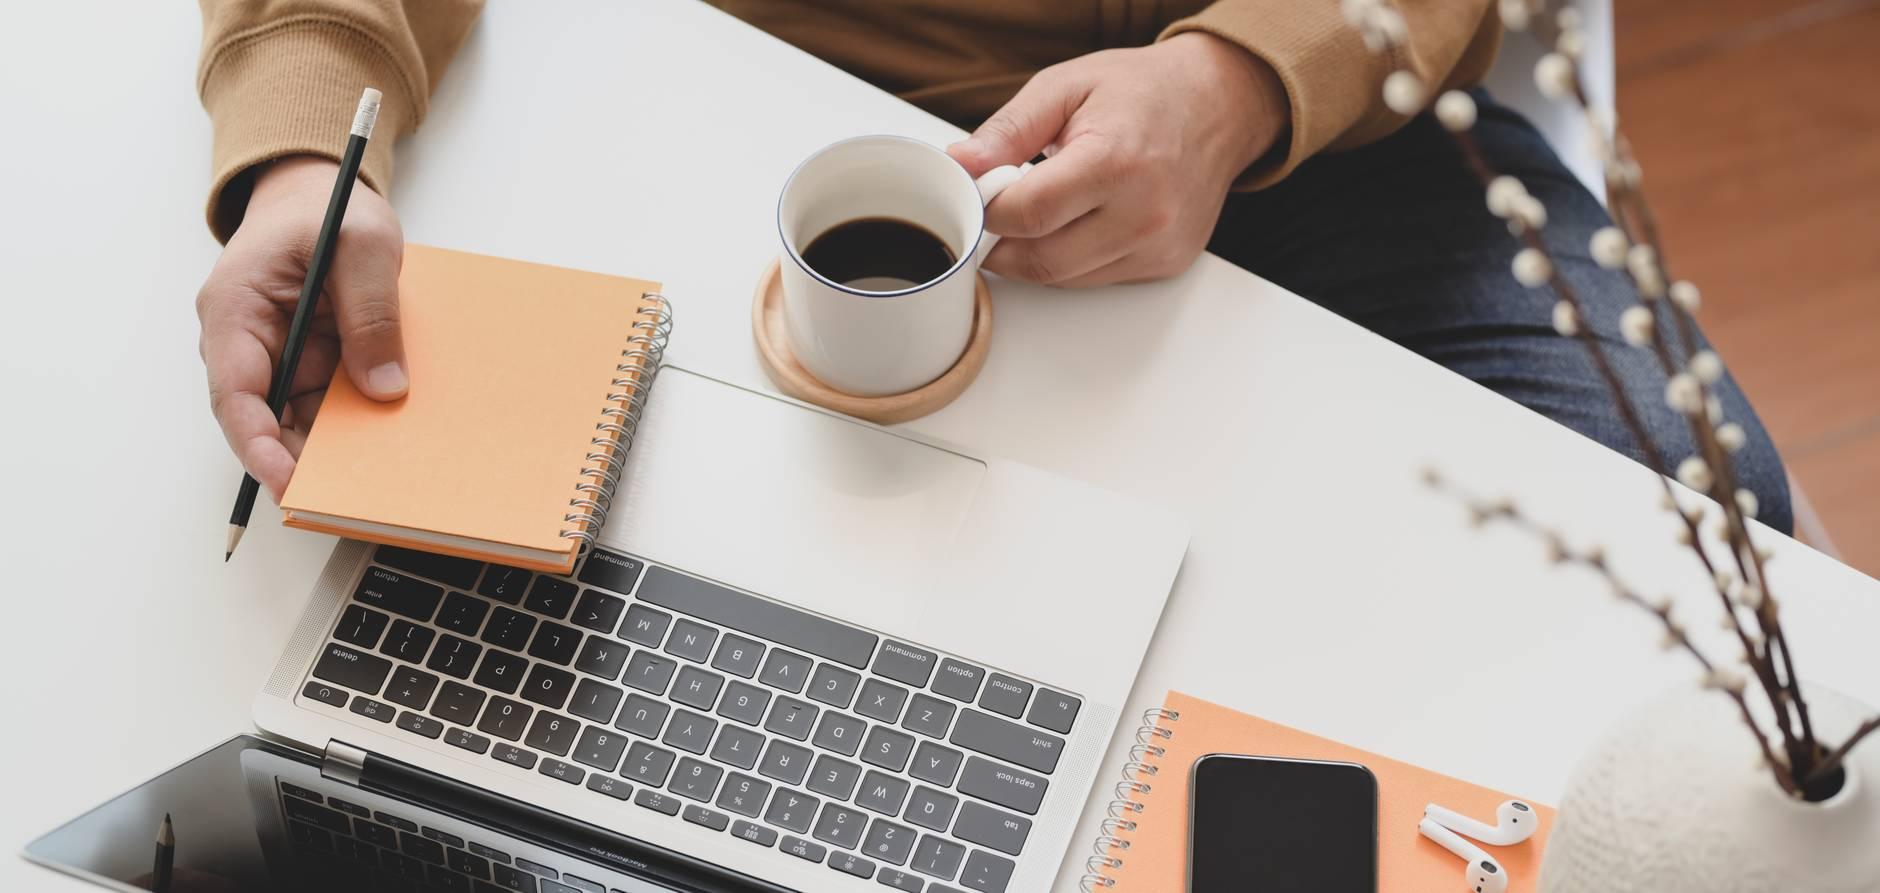 person holding white ceramic mug beside macbook pro